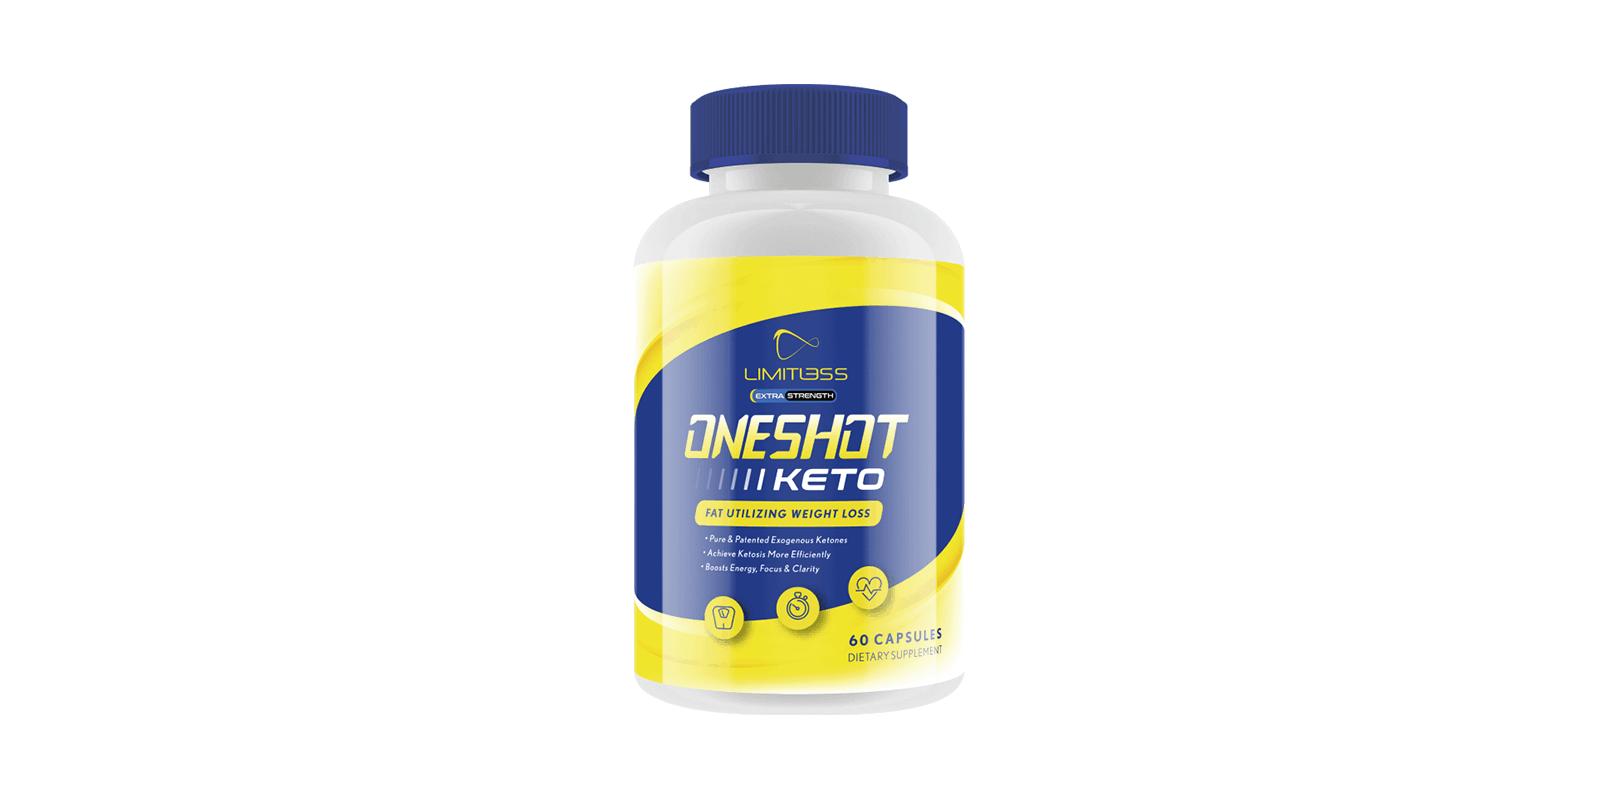 One shot keto supplement